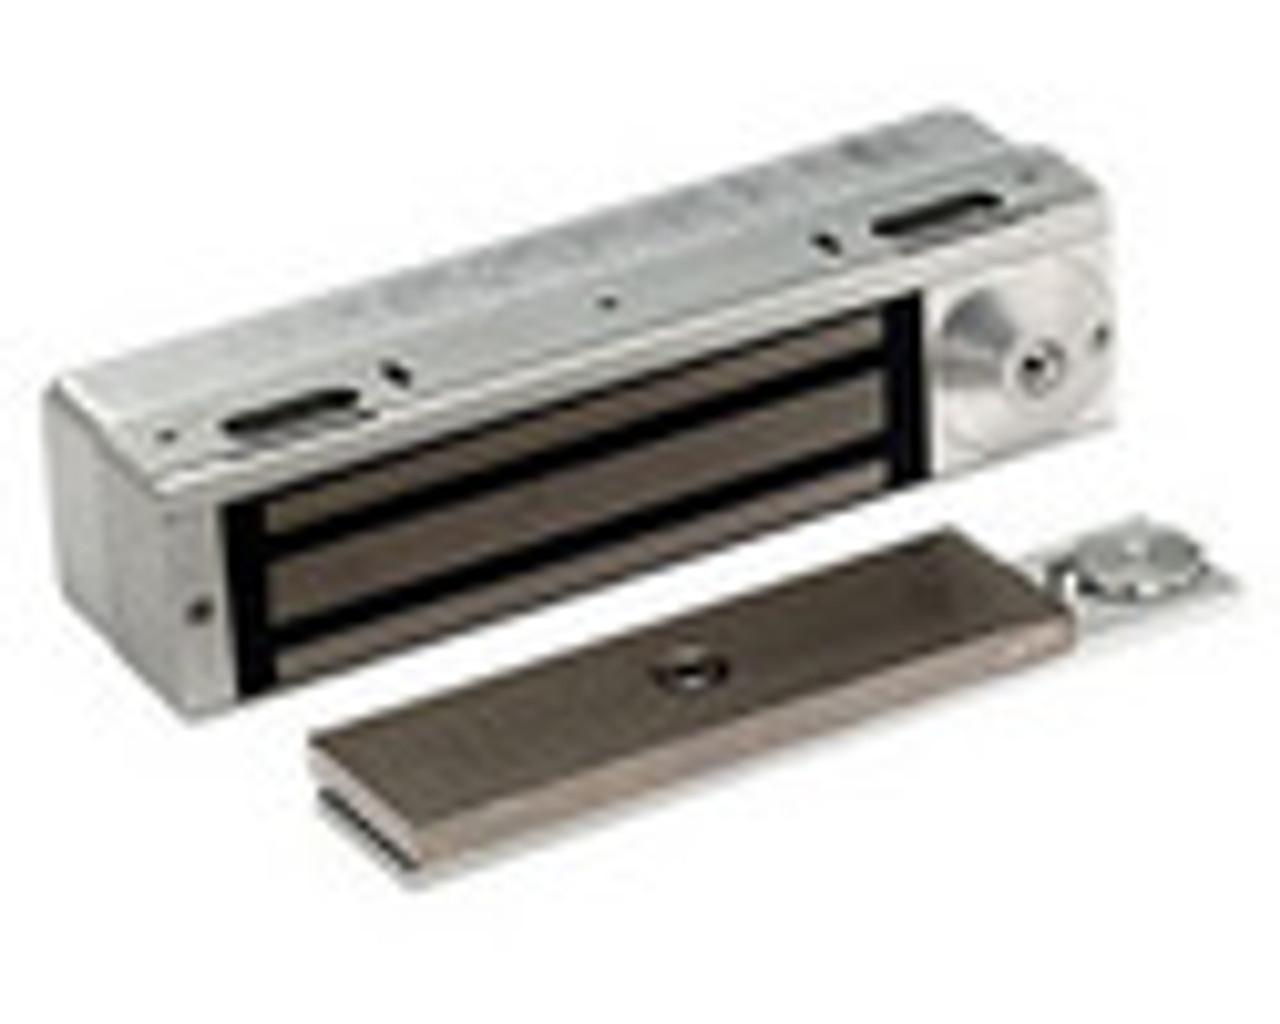 3101C-DSM-US10 DynaLock 3101C Series Delay Egress Electromagnetic Lock for Single Outswing Door with DSM in Satin Bronze